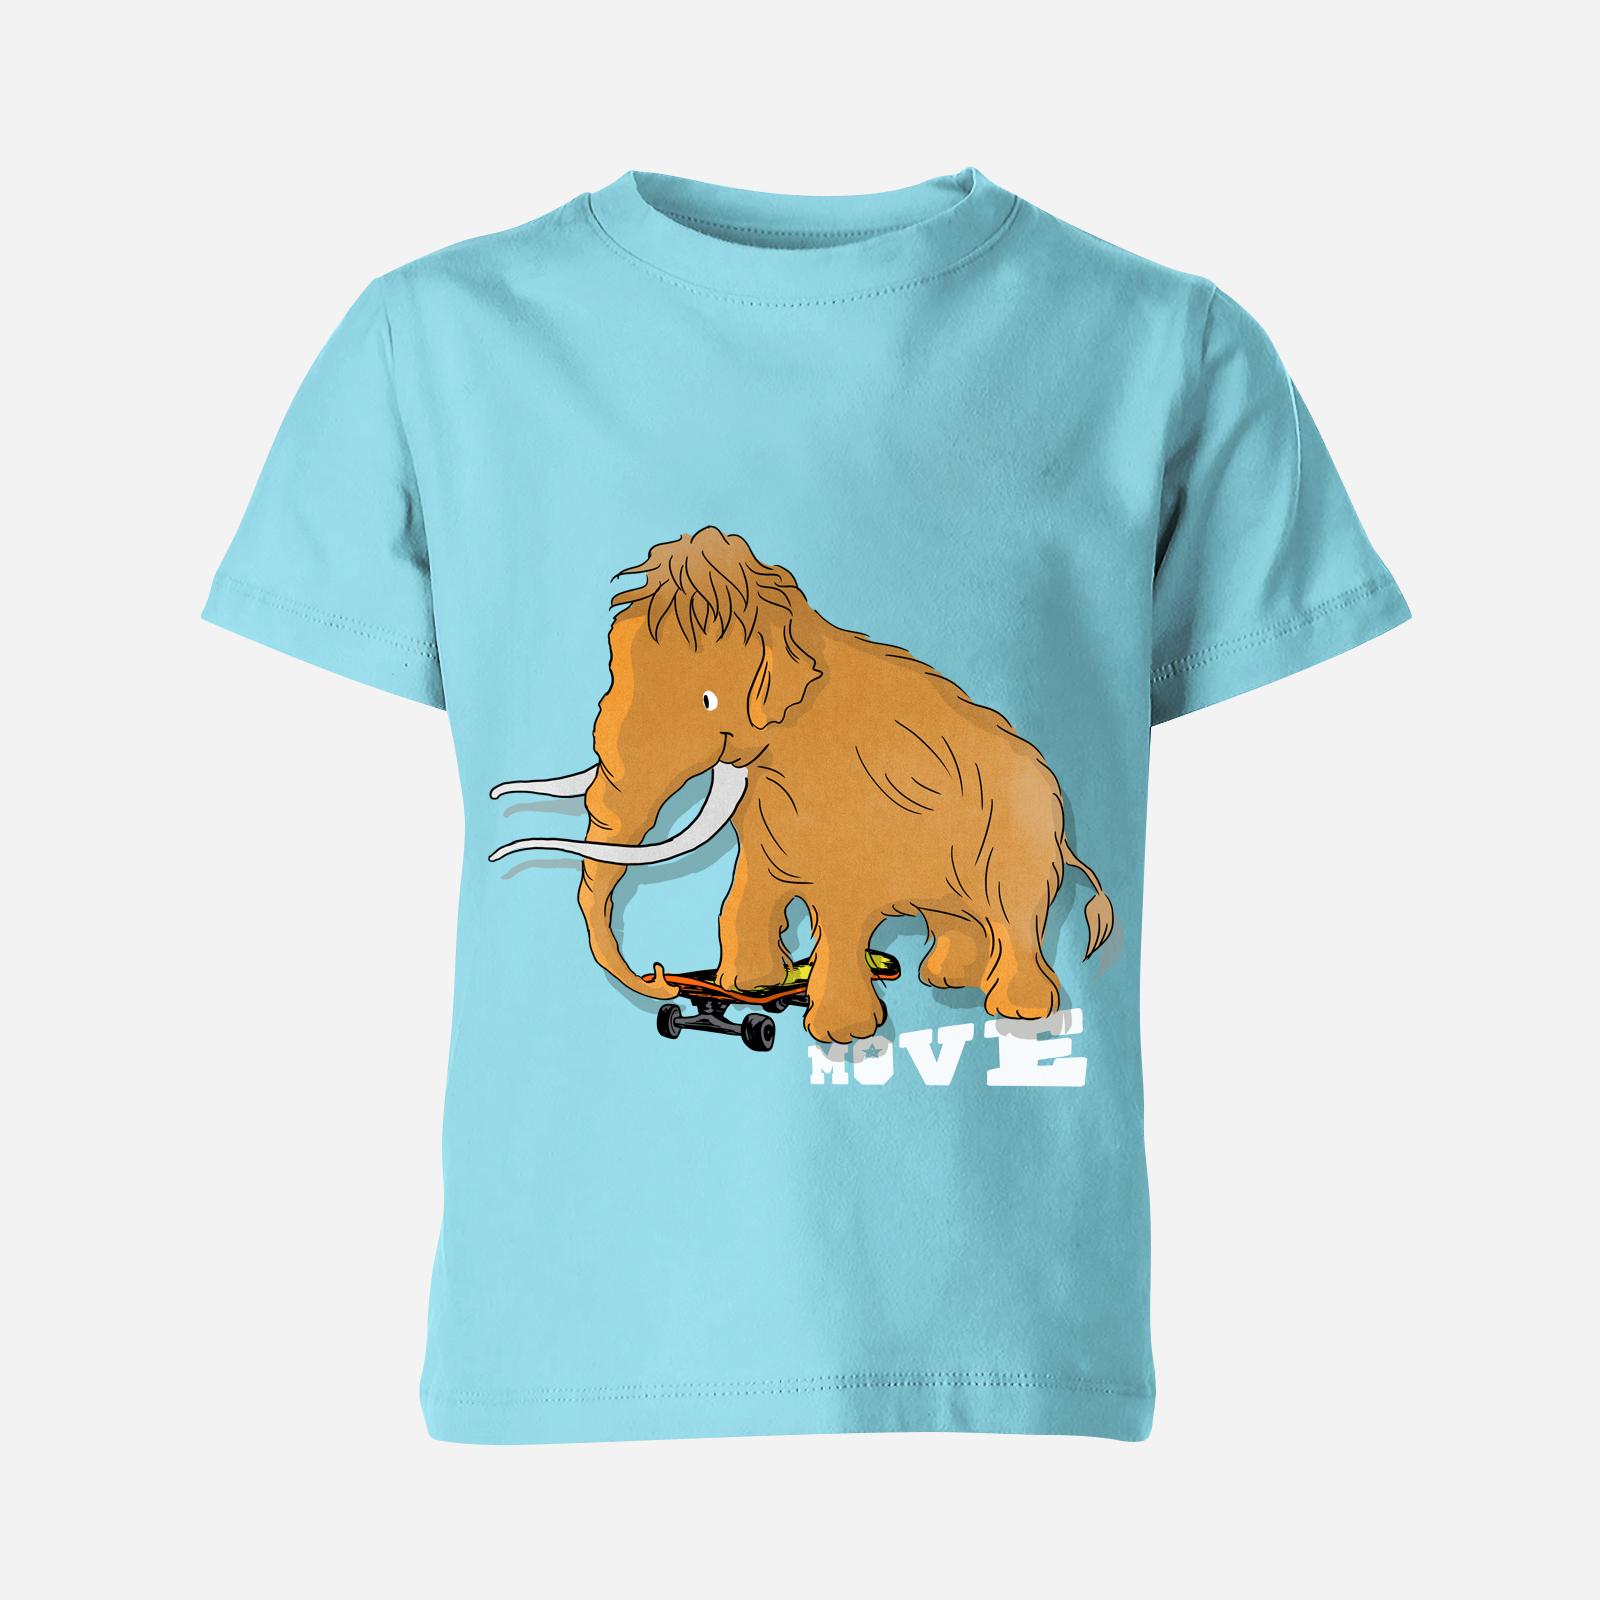 T-Shirt UNI Motiv FS 20-1.3, A. Kiel